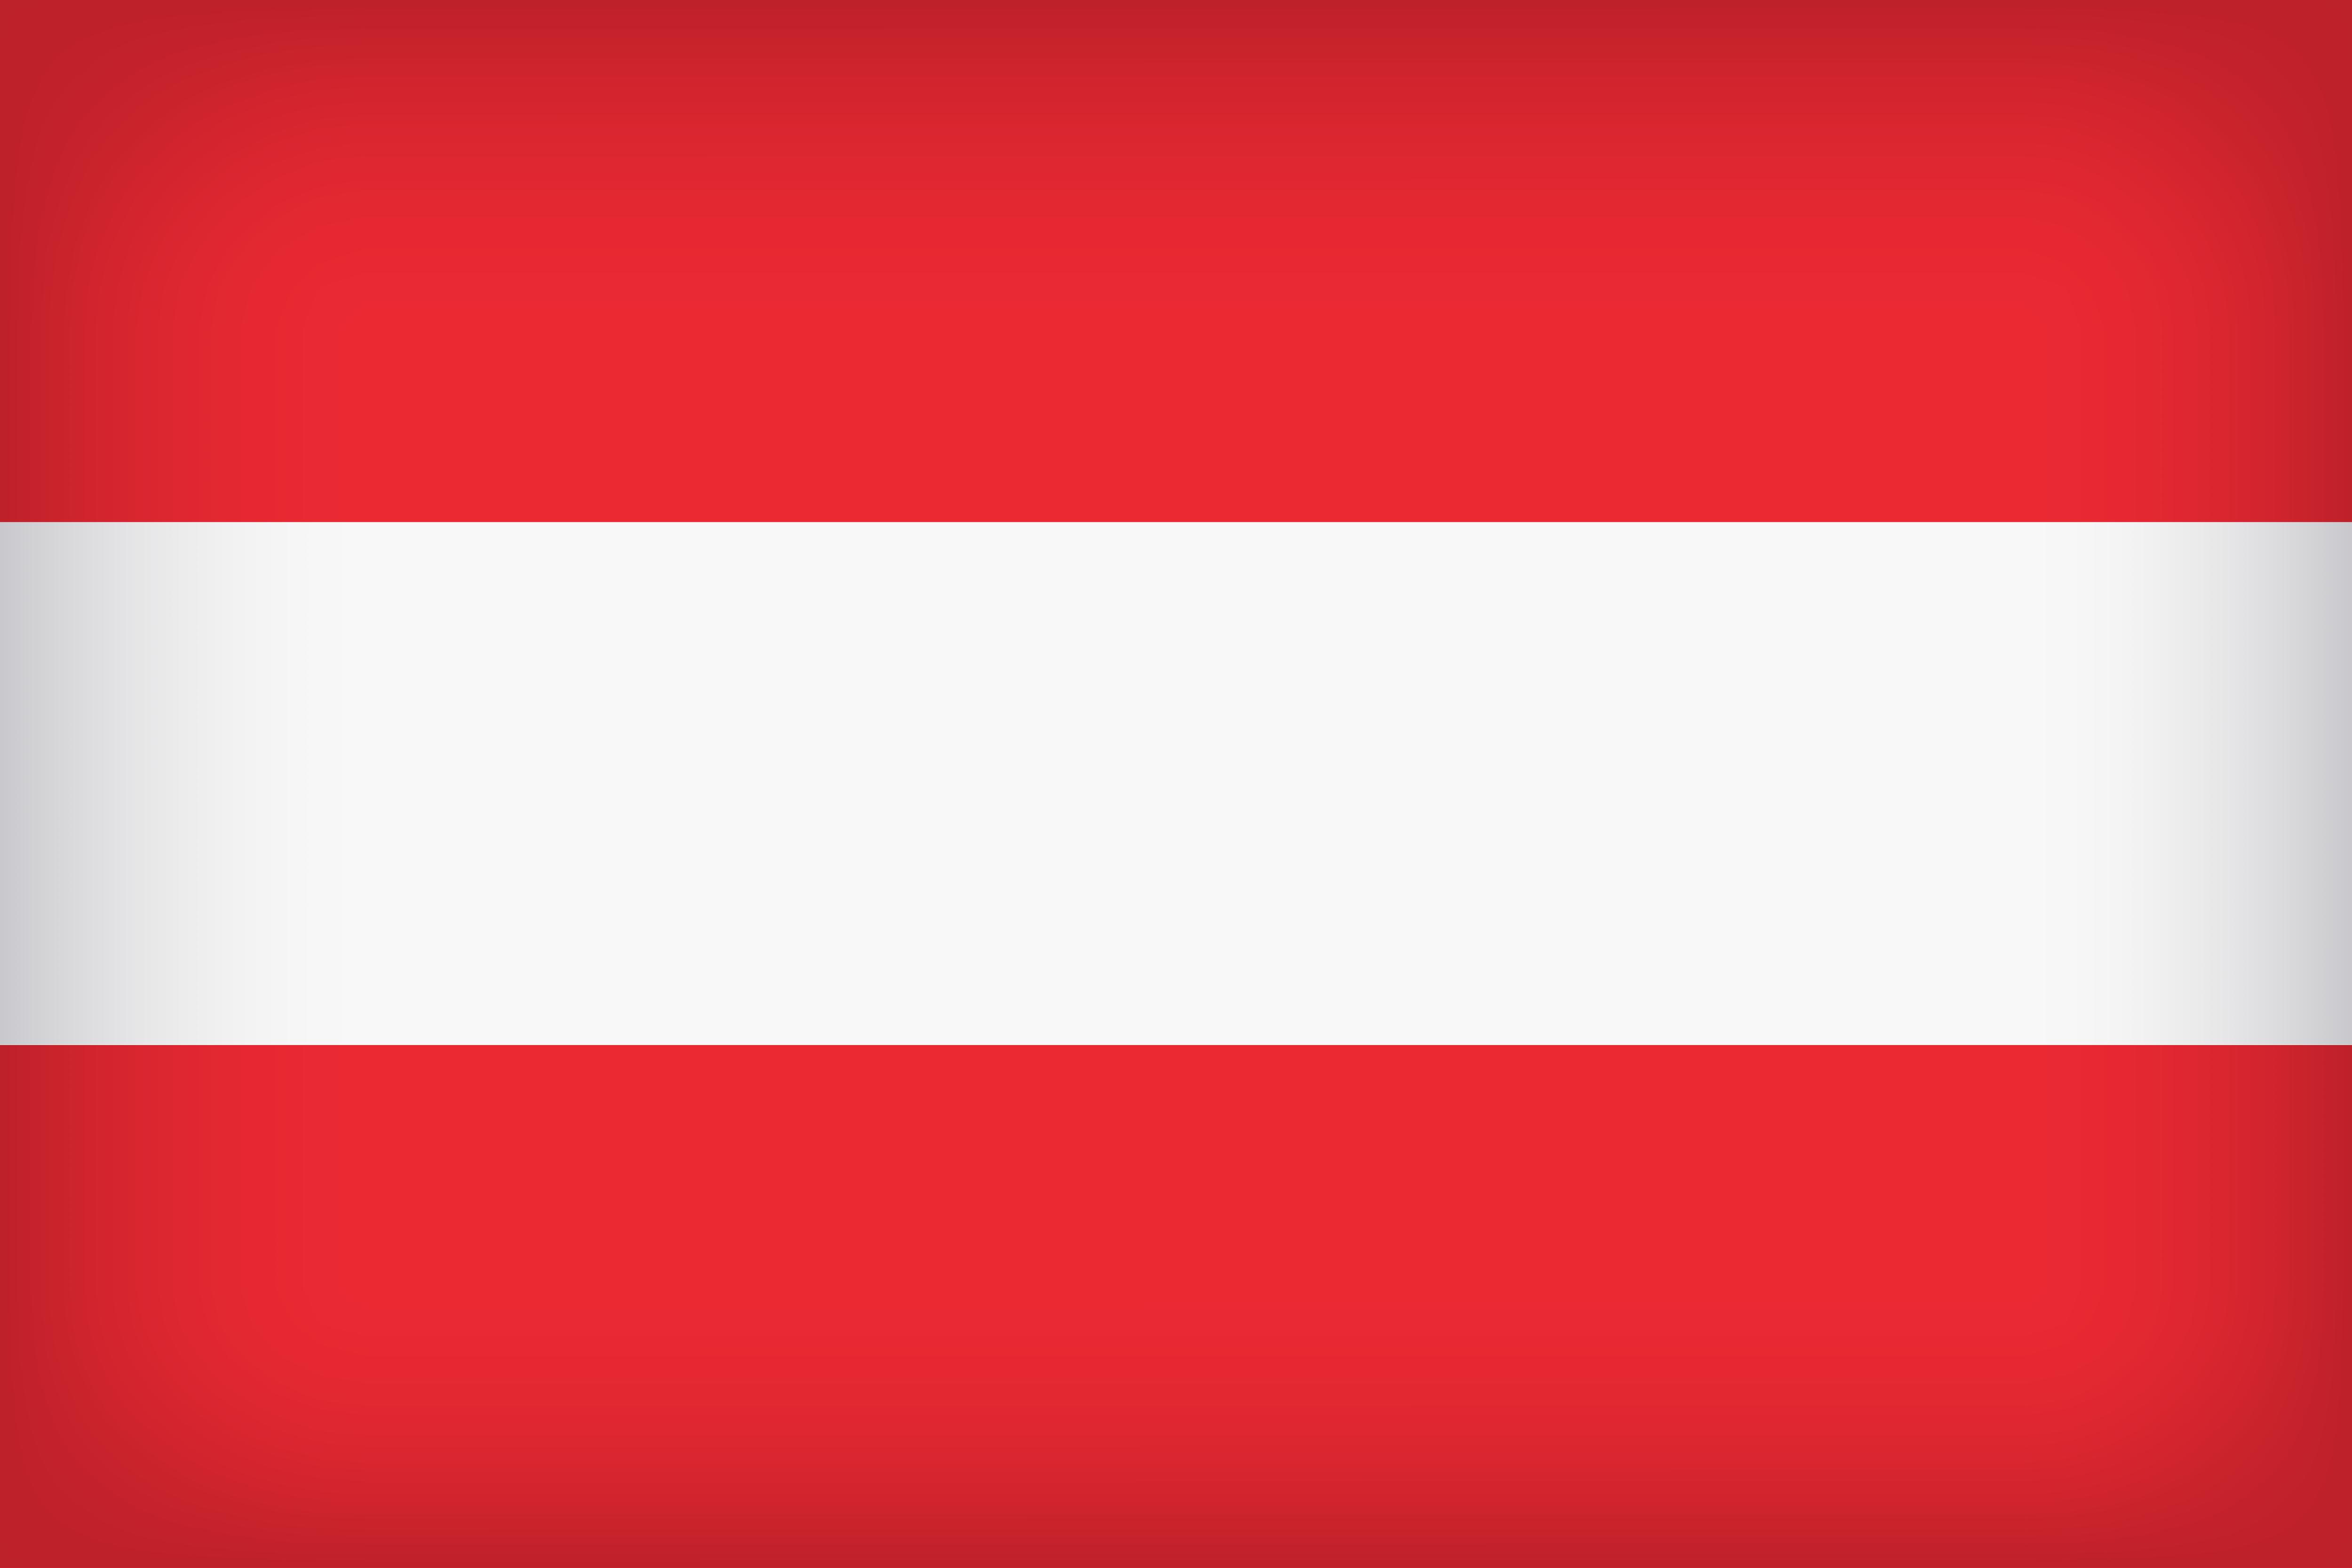 Austria Large Flag.